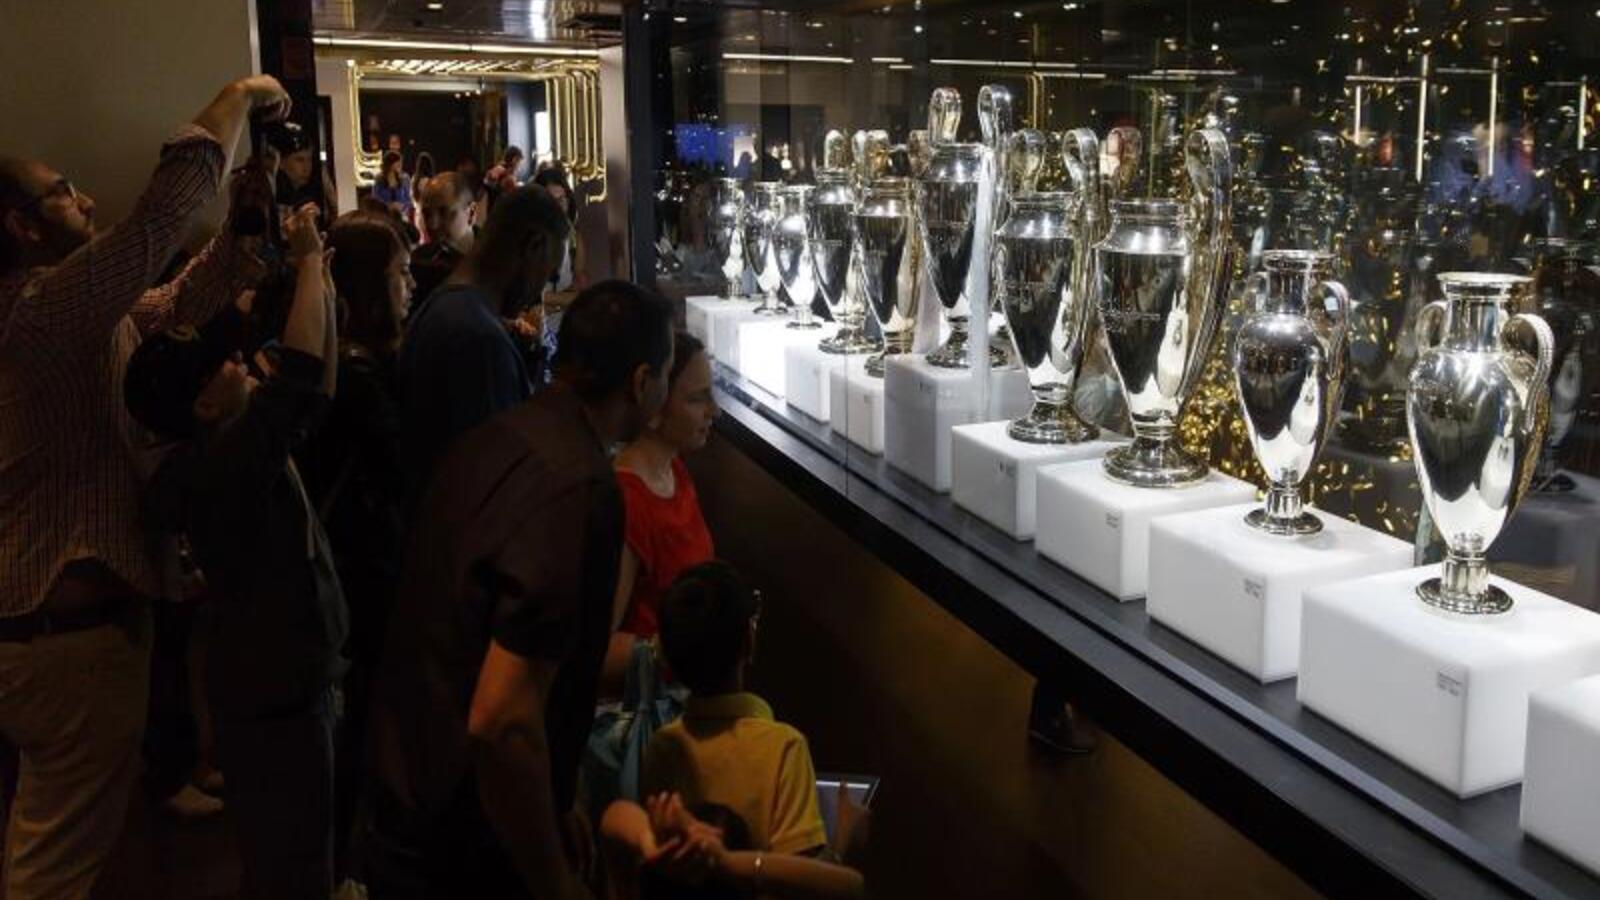 خسائر ريال مدريد بسبب فيروس كورونا